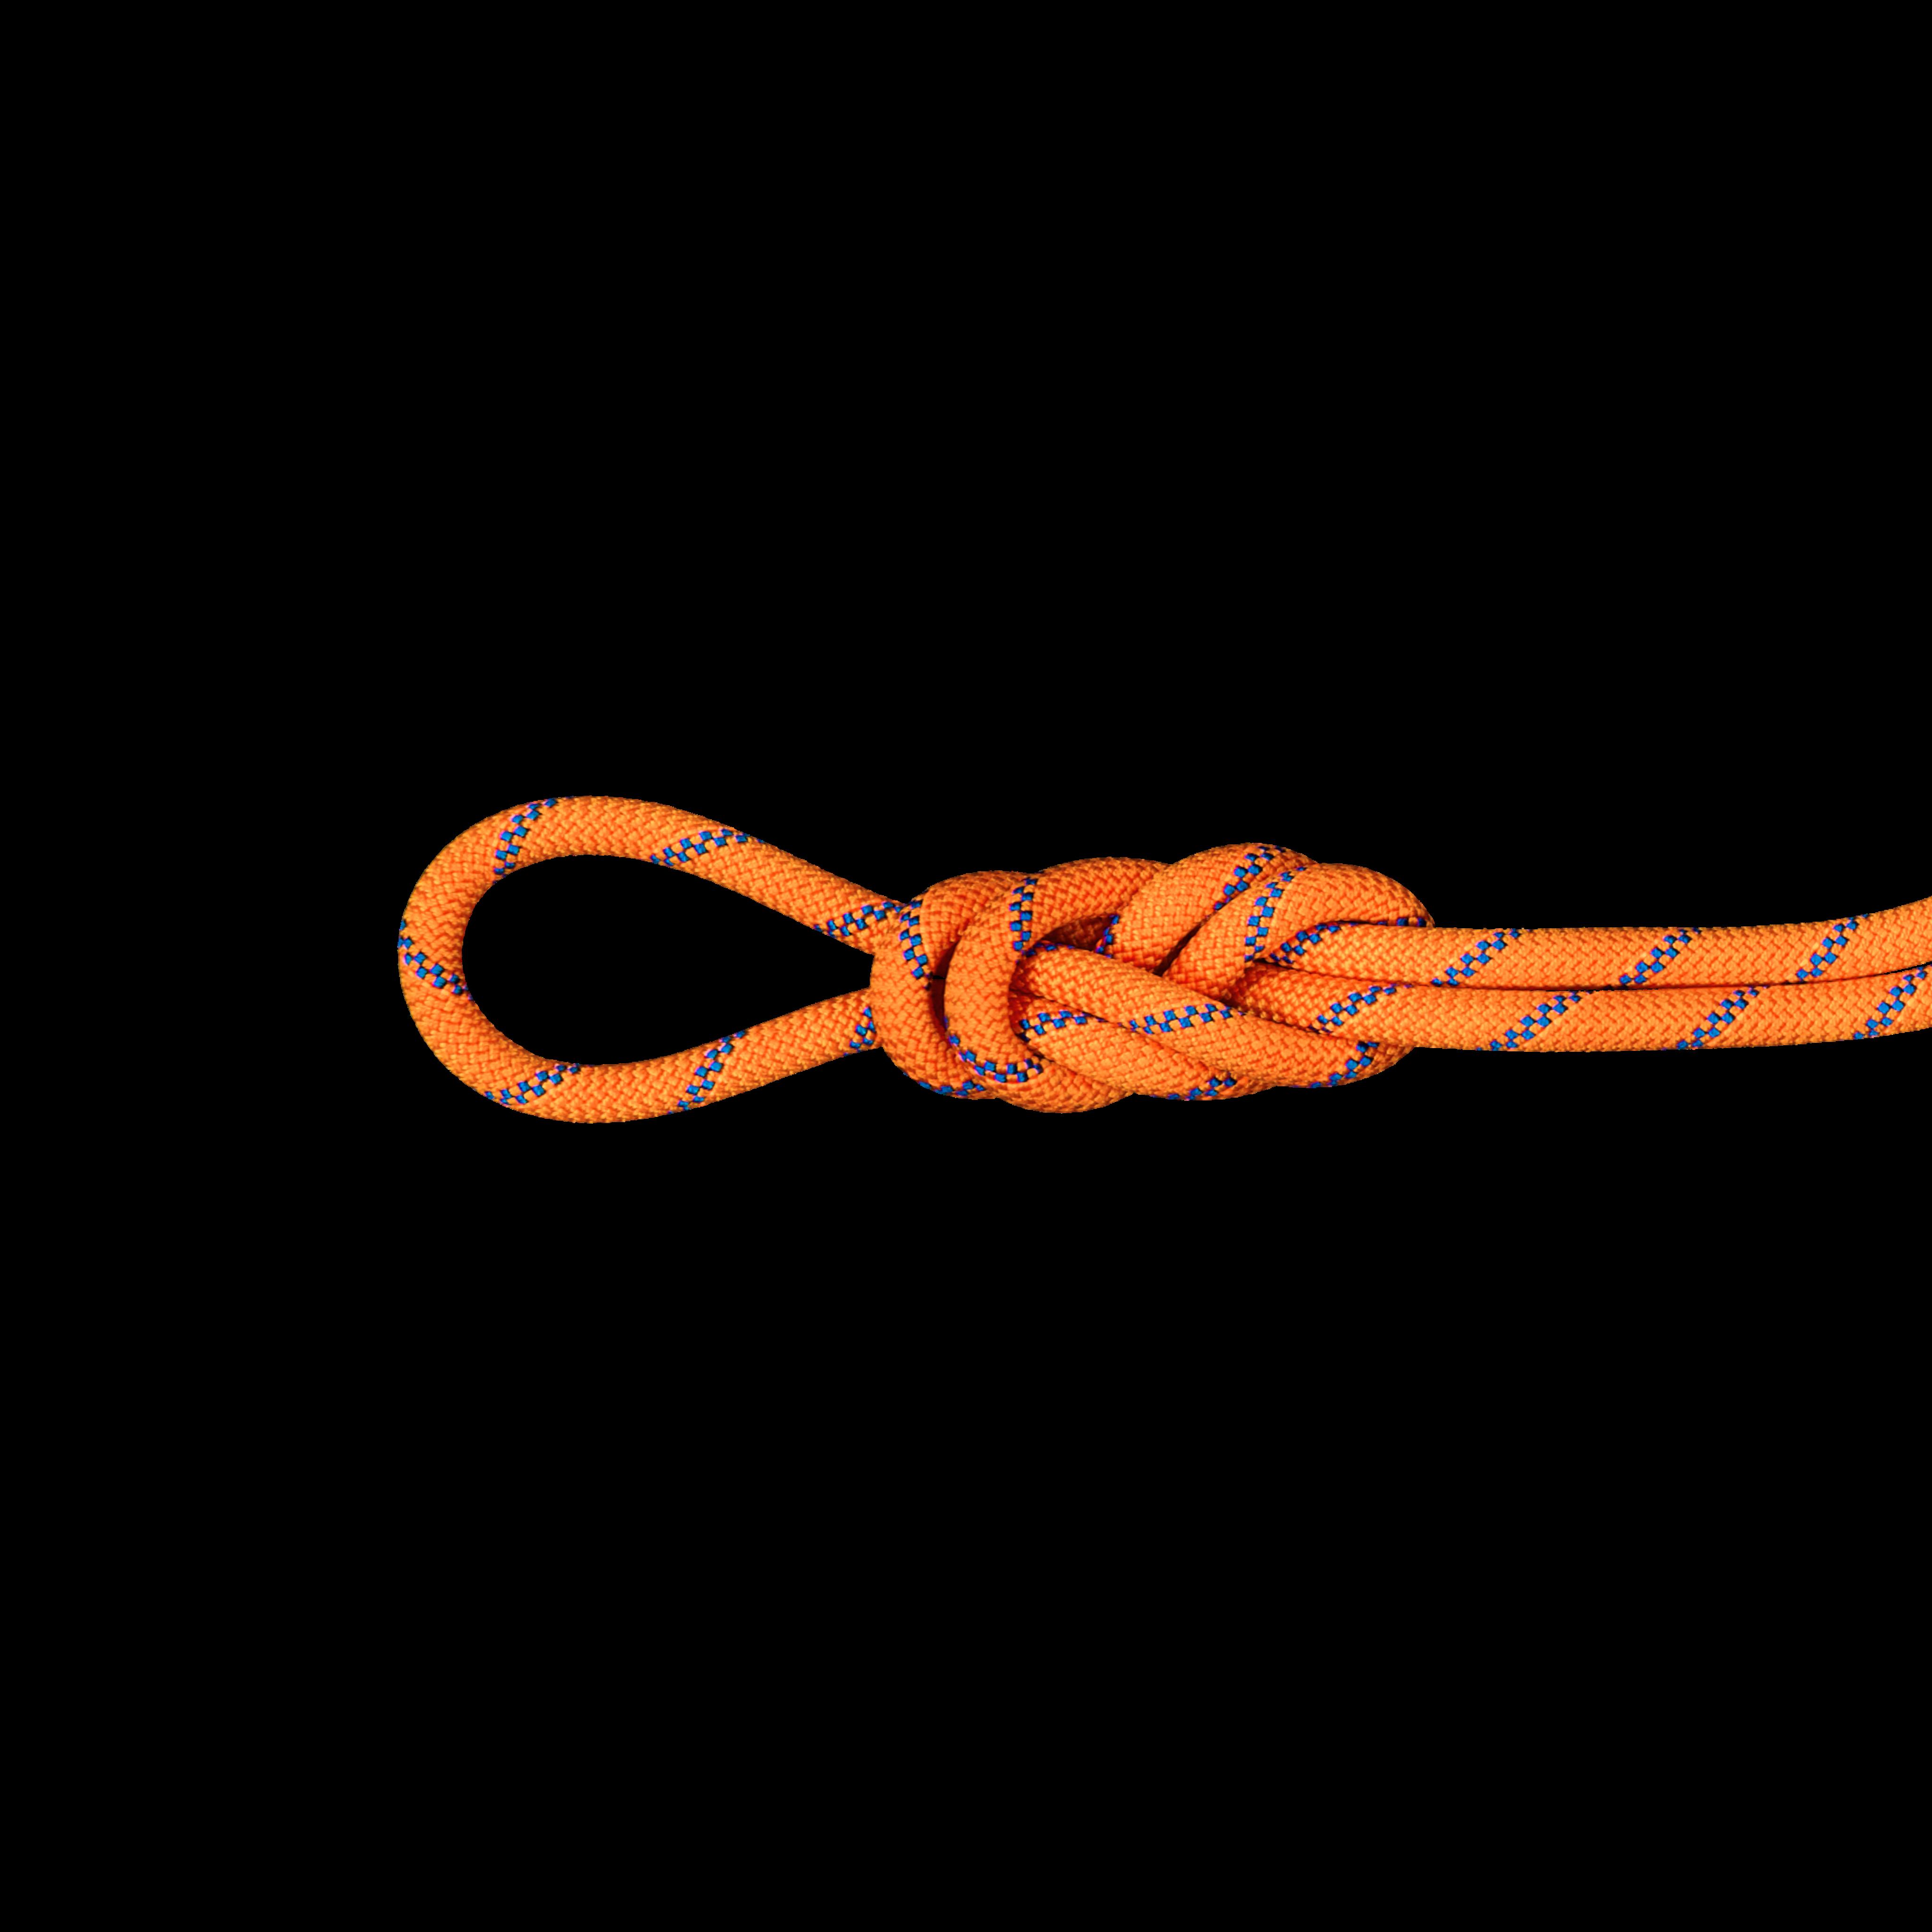 9.0 Alpine Sender Dry Rope - 60 m, Dry Standard, sunrise-ice thumbnail